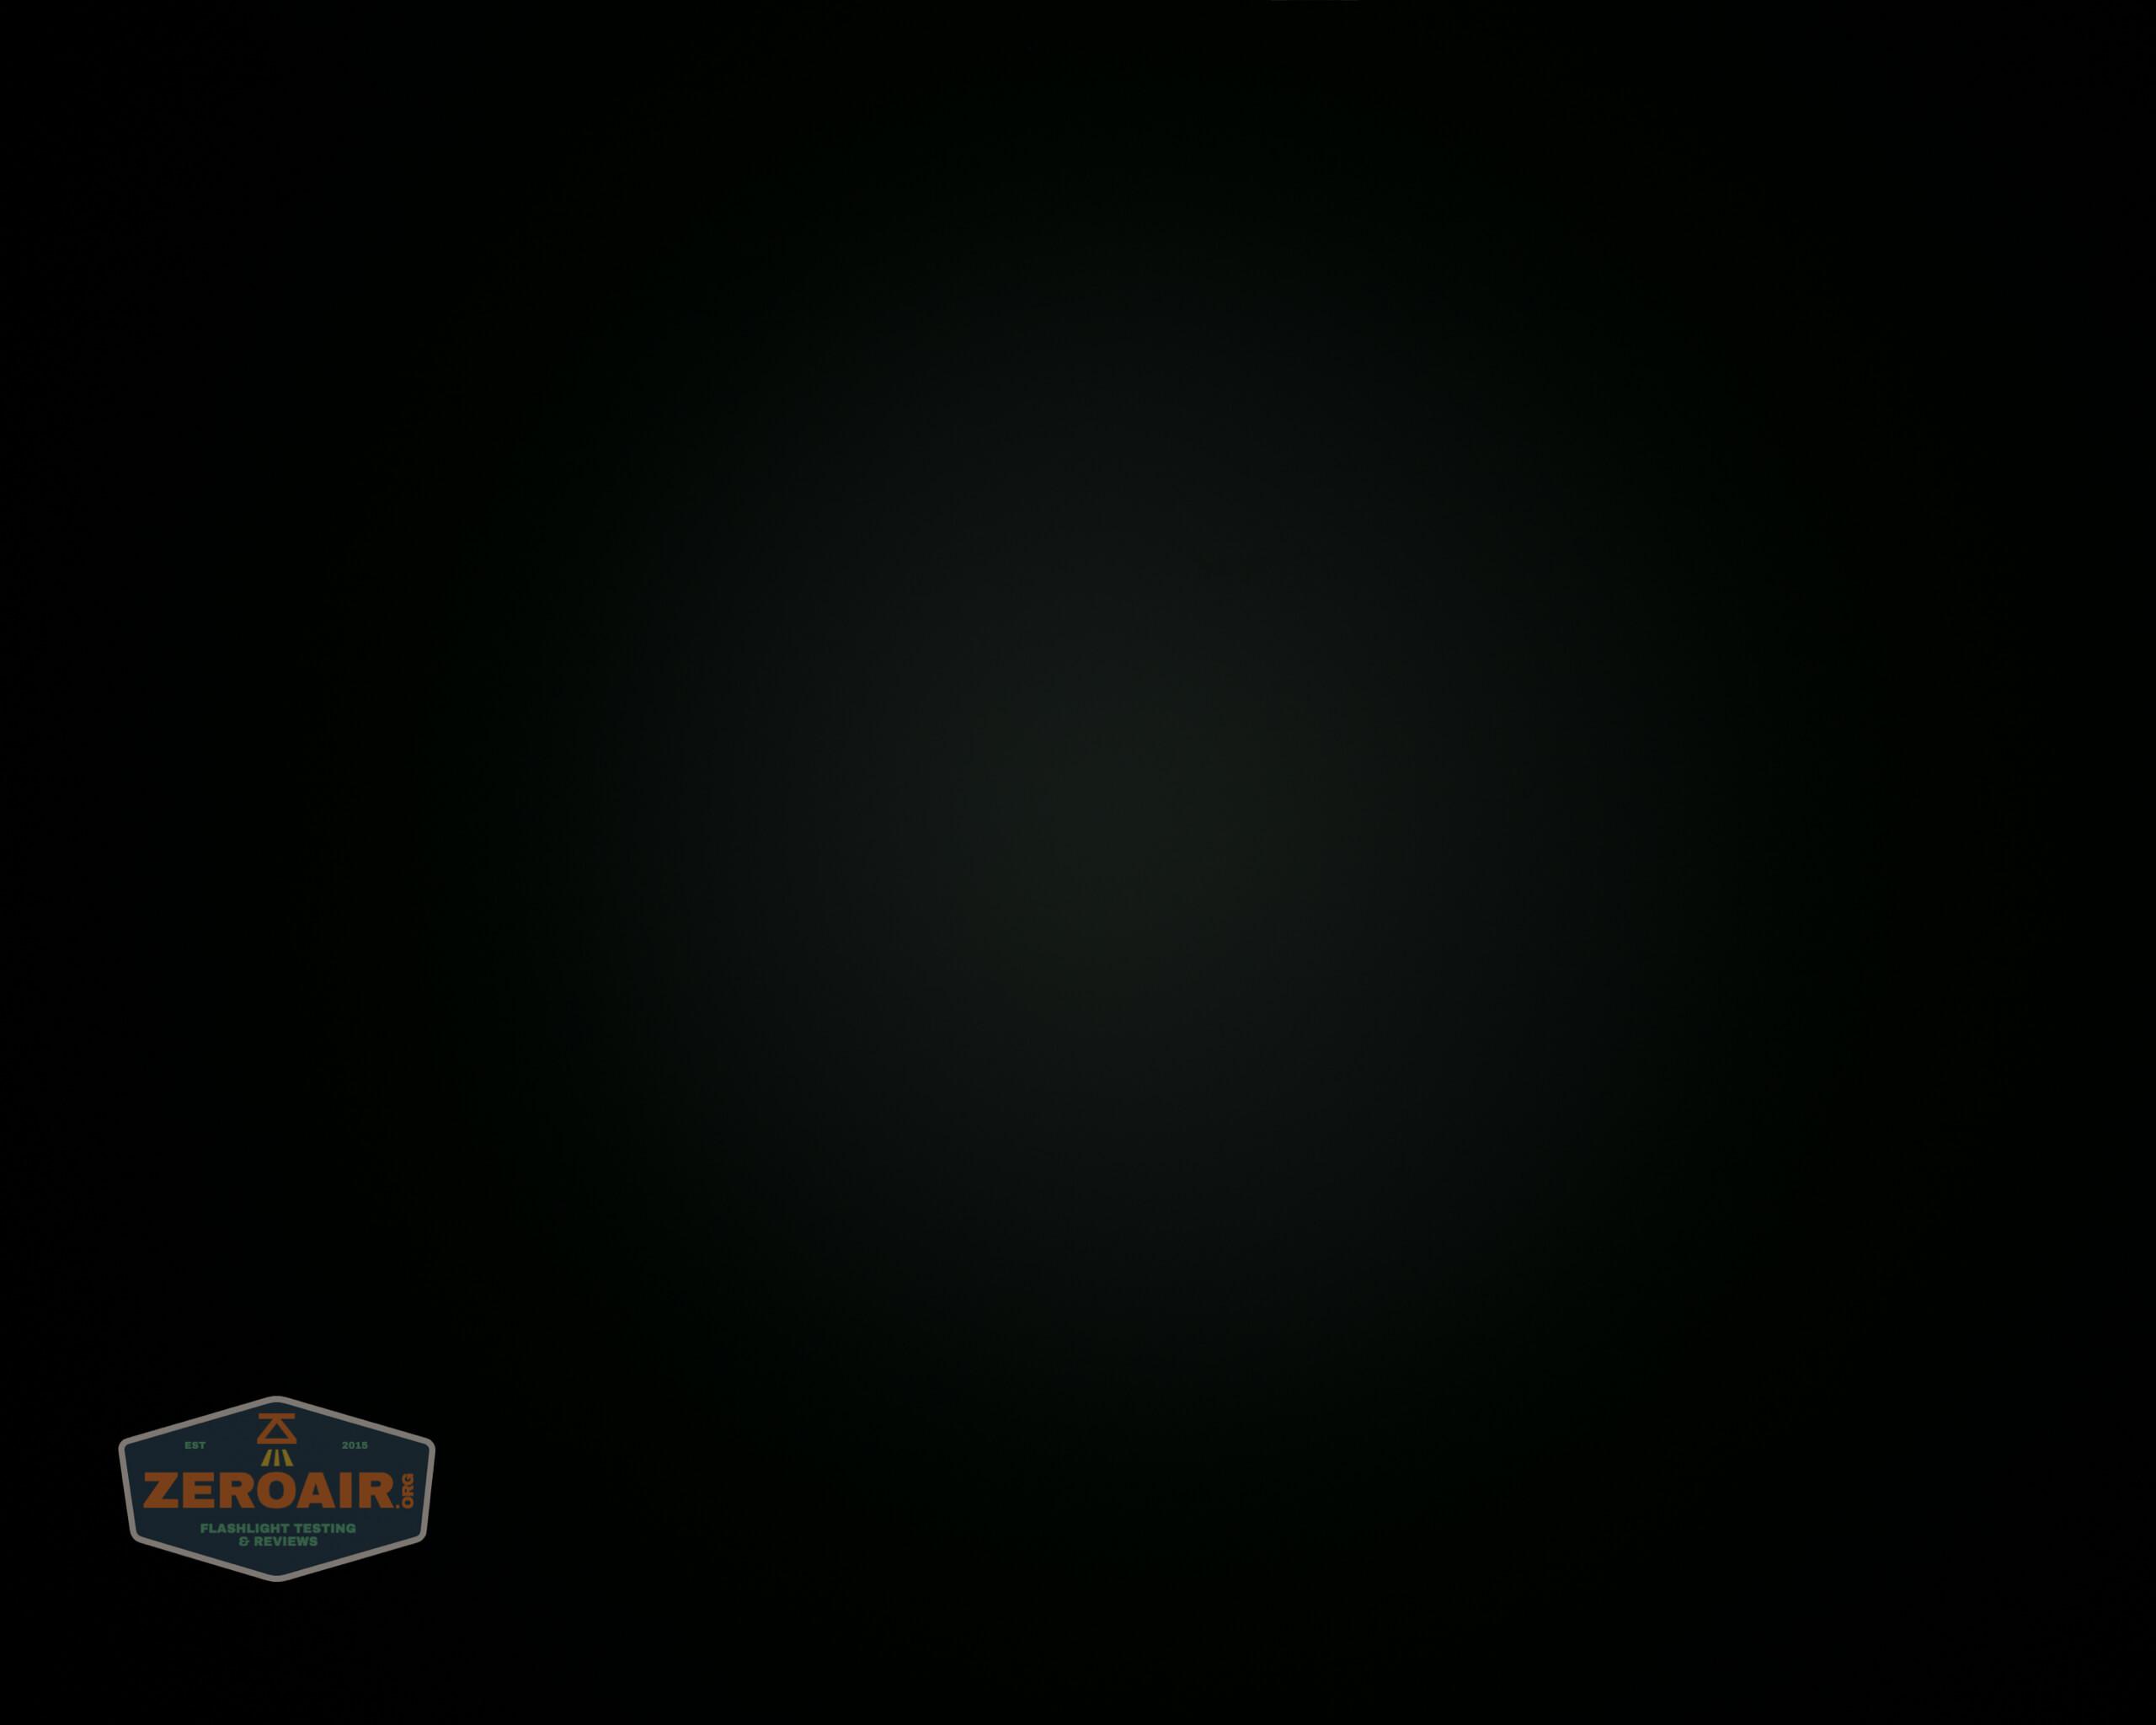 olight perun 2 21700 headlamp orange beamshot ceiling 2